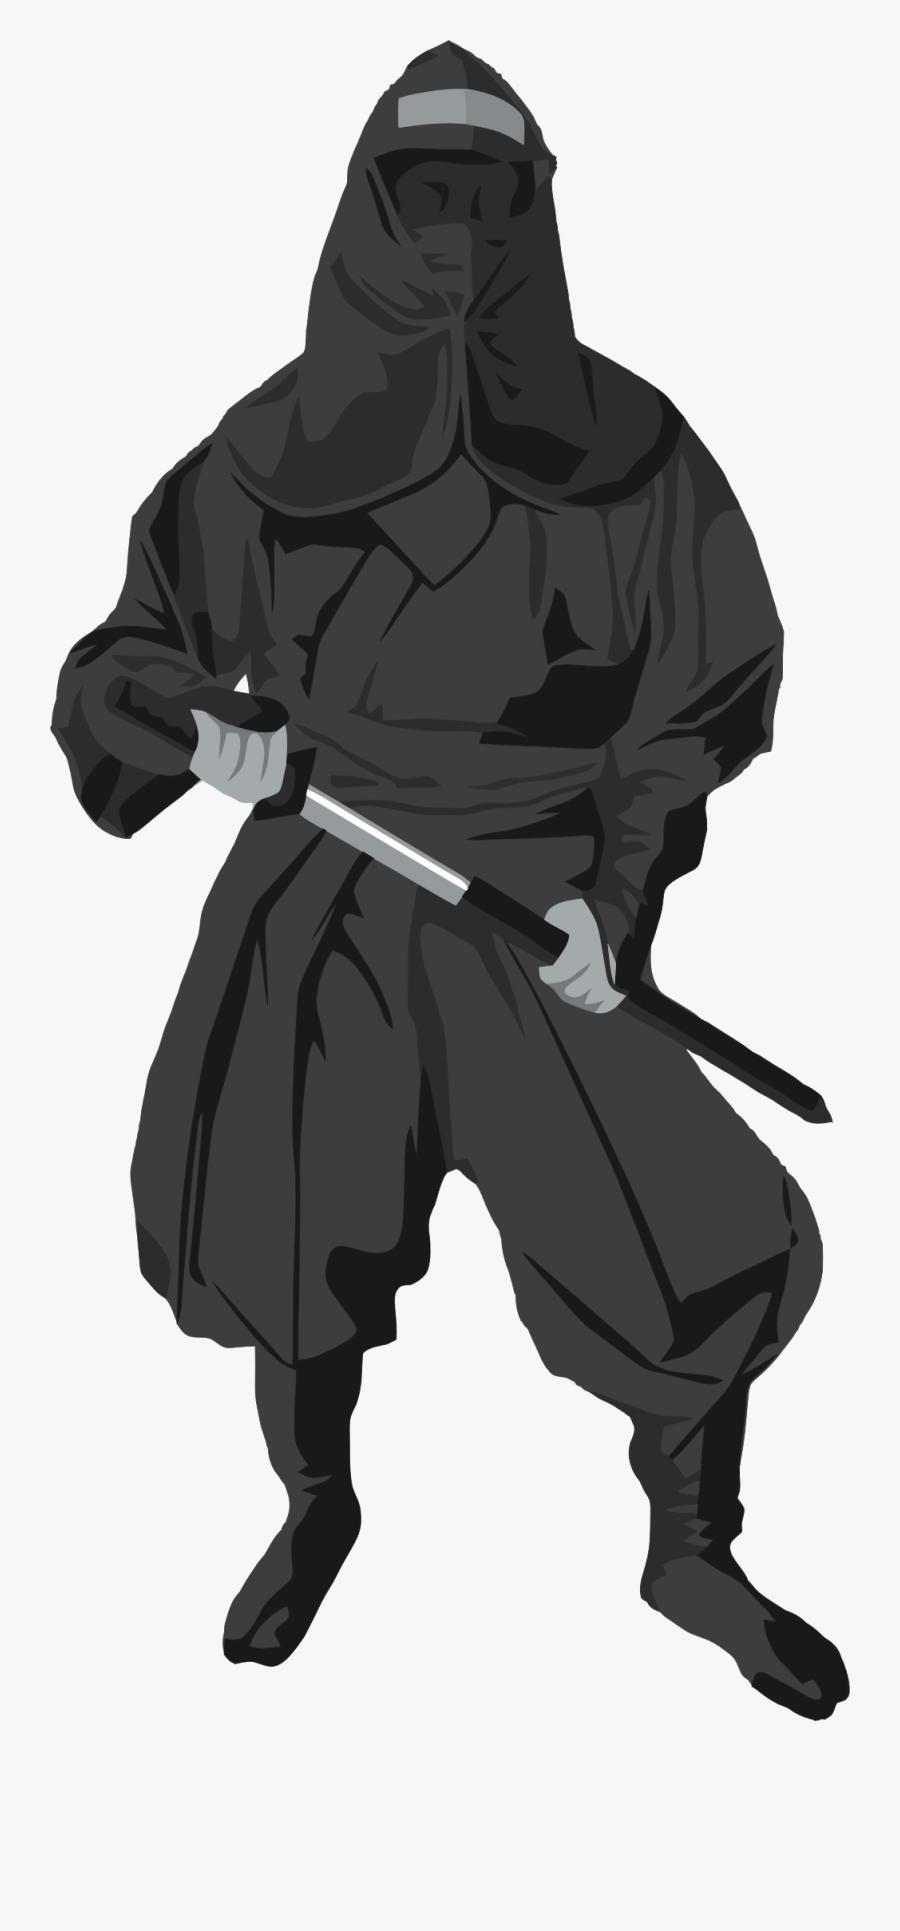 Free To Use & Public Domain Ninja Clip Art - Ninja Art Transparent, Transparent Clipart